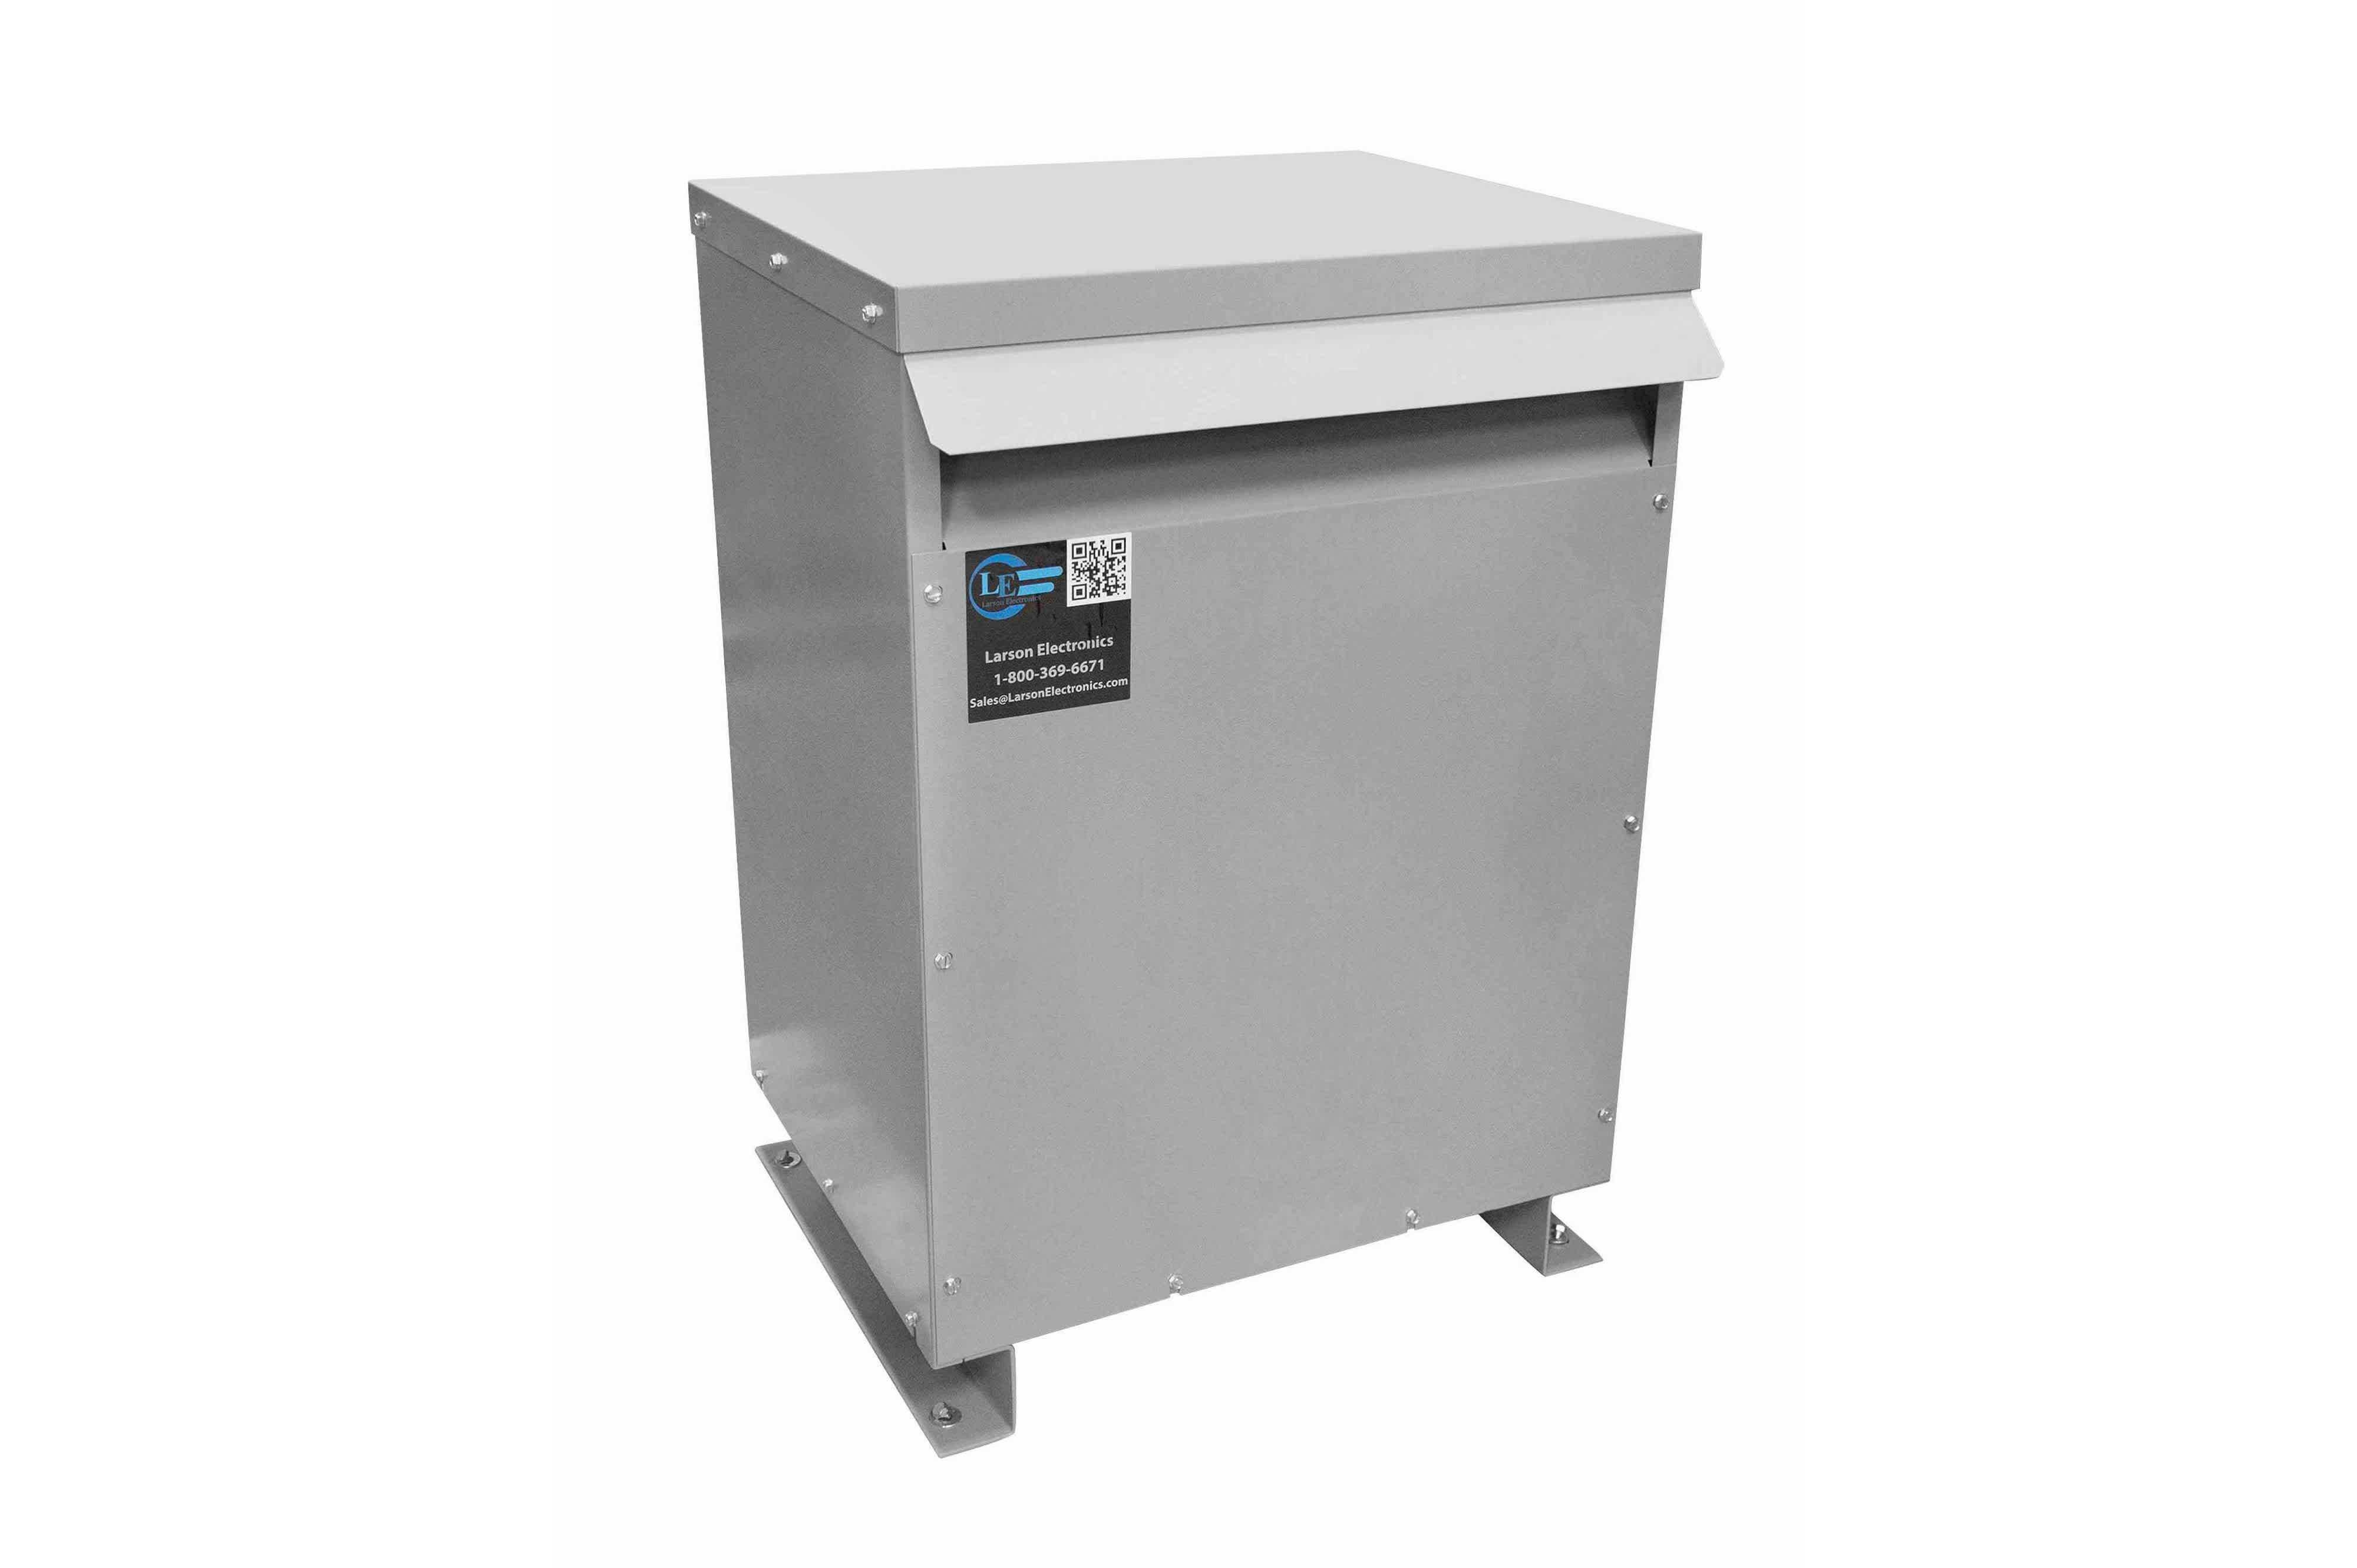 110 kVA 3PH Isolation Transformer, 208V Wye Primary, 208V Delta Secondary, N3R, Ventilated, 60 Hz